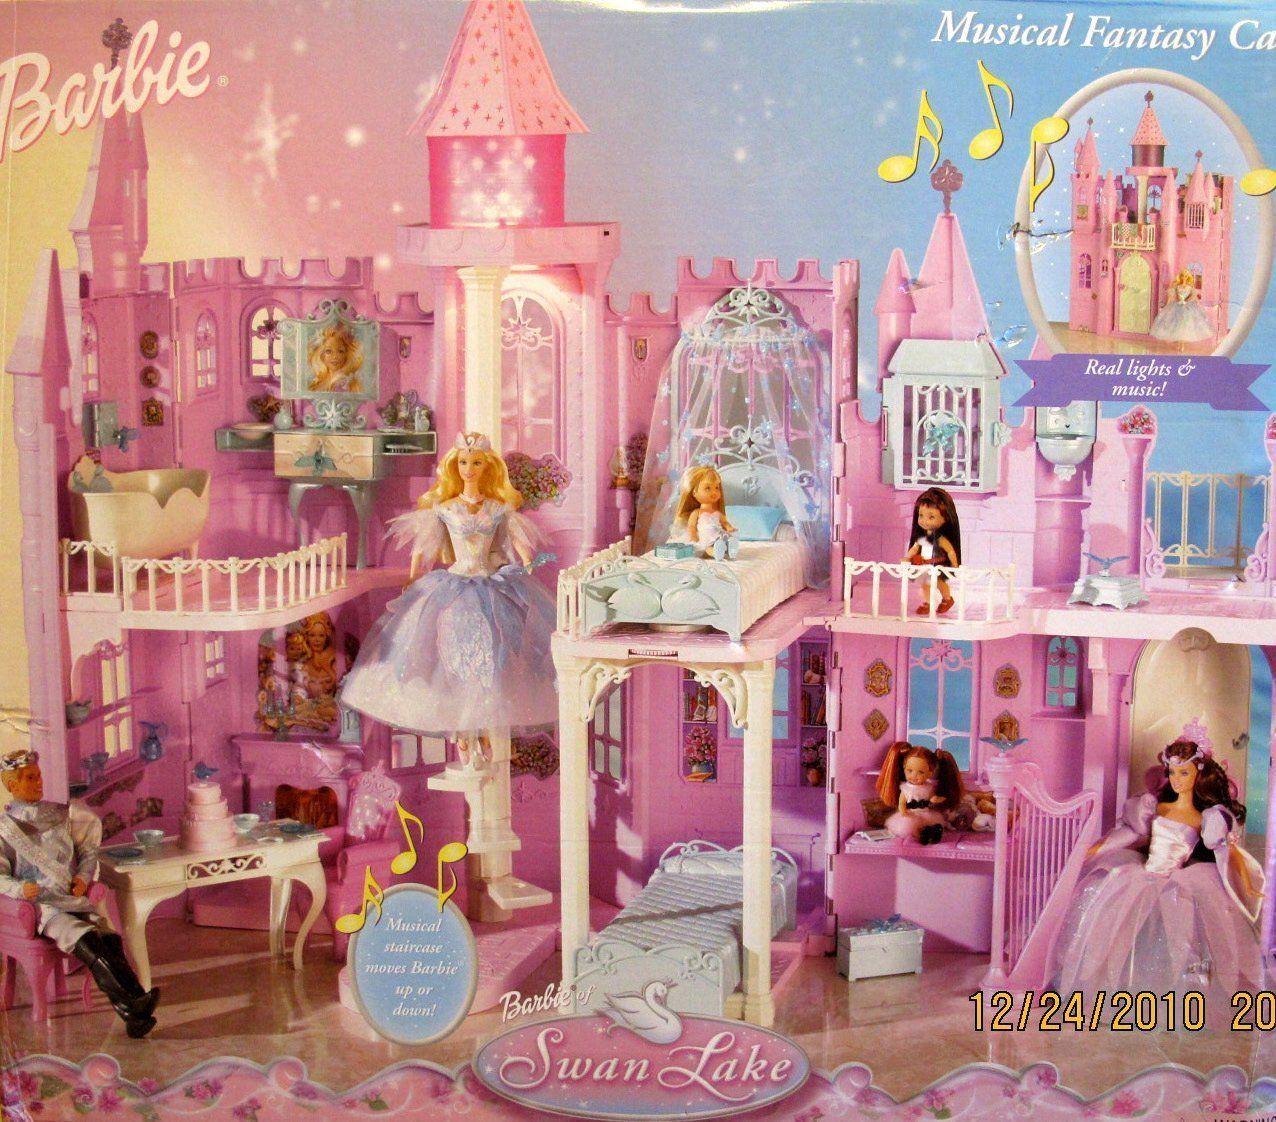 Amazon Com Barbie Of Swan Lake Musical Fantasy Castletm Playset